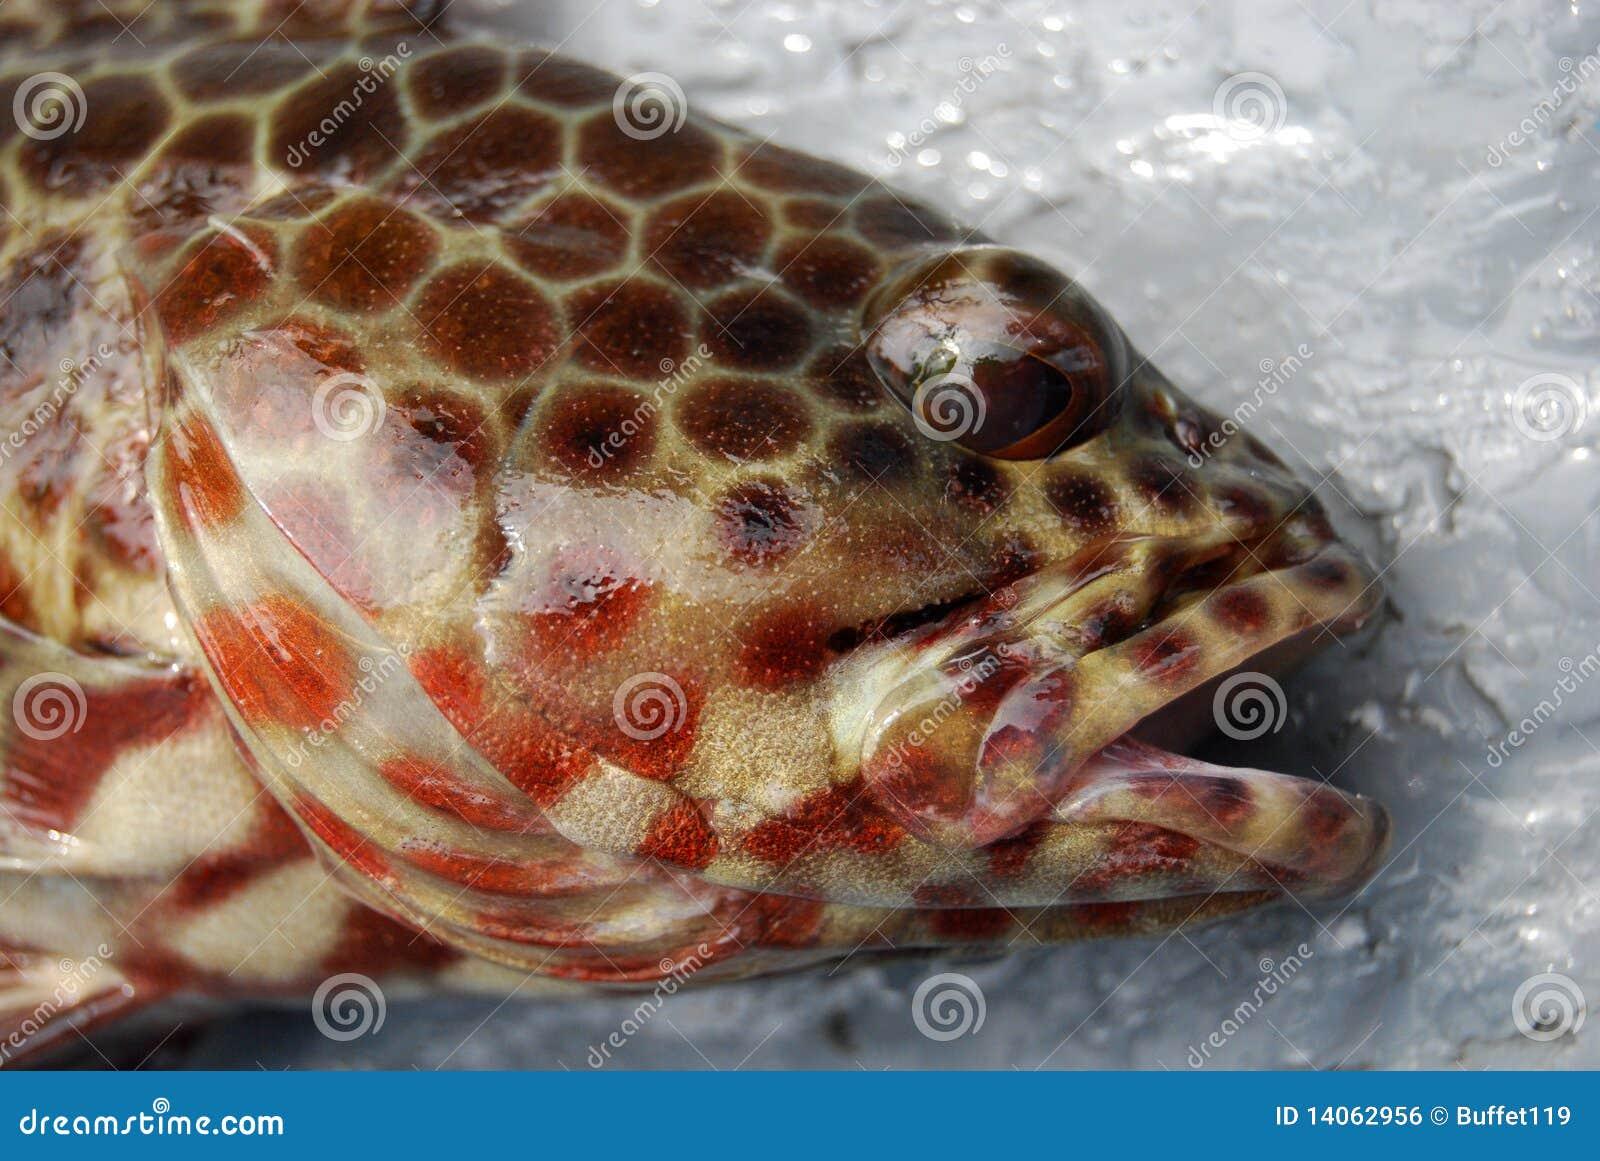 Fish head royalty free stock image image 14062956 for Fish head app